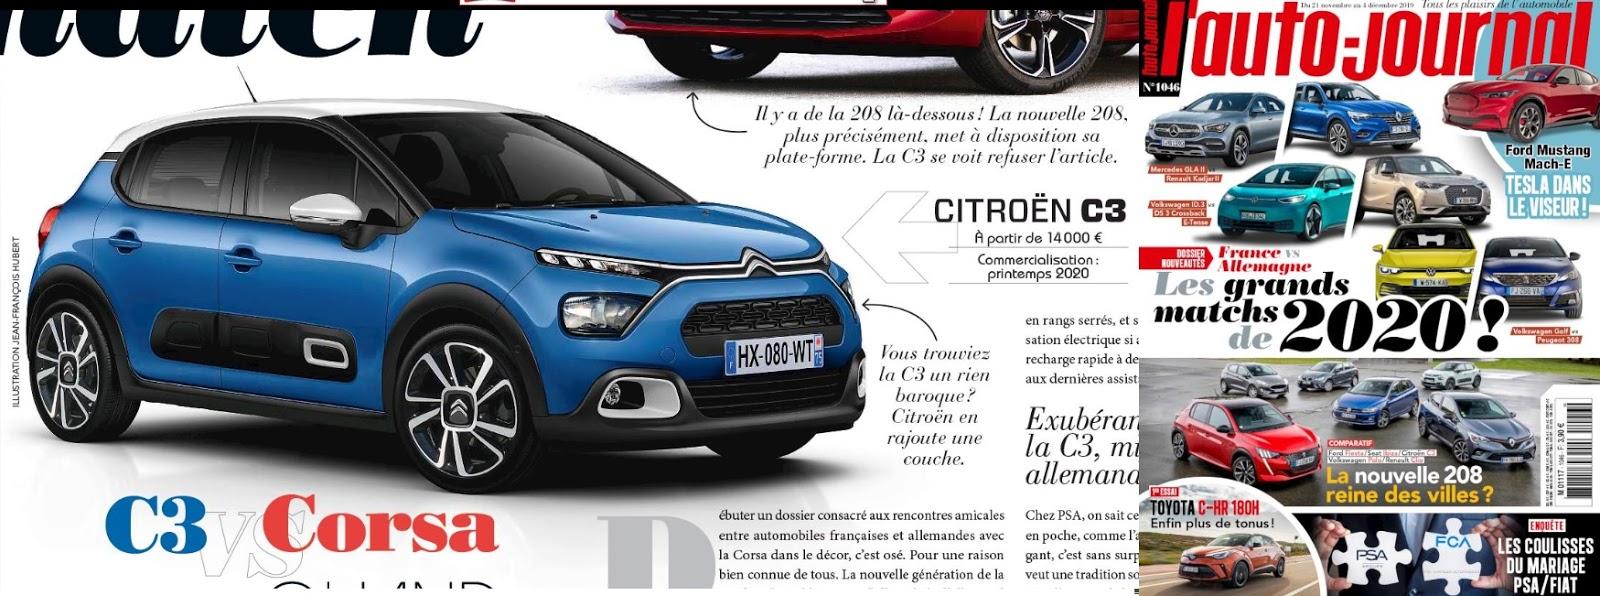 2020 - [Citroën] C3 III restylée  0.0007